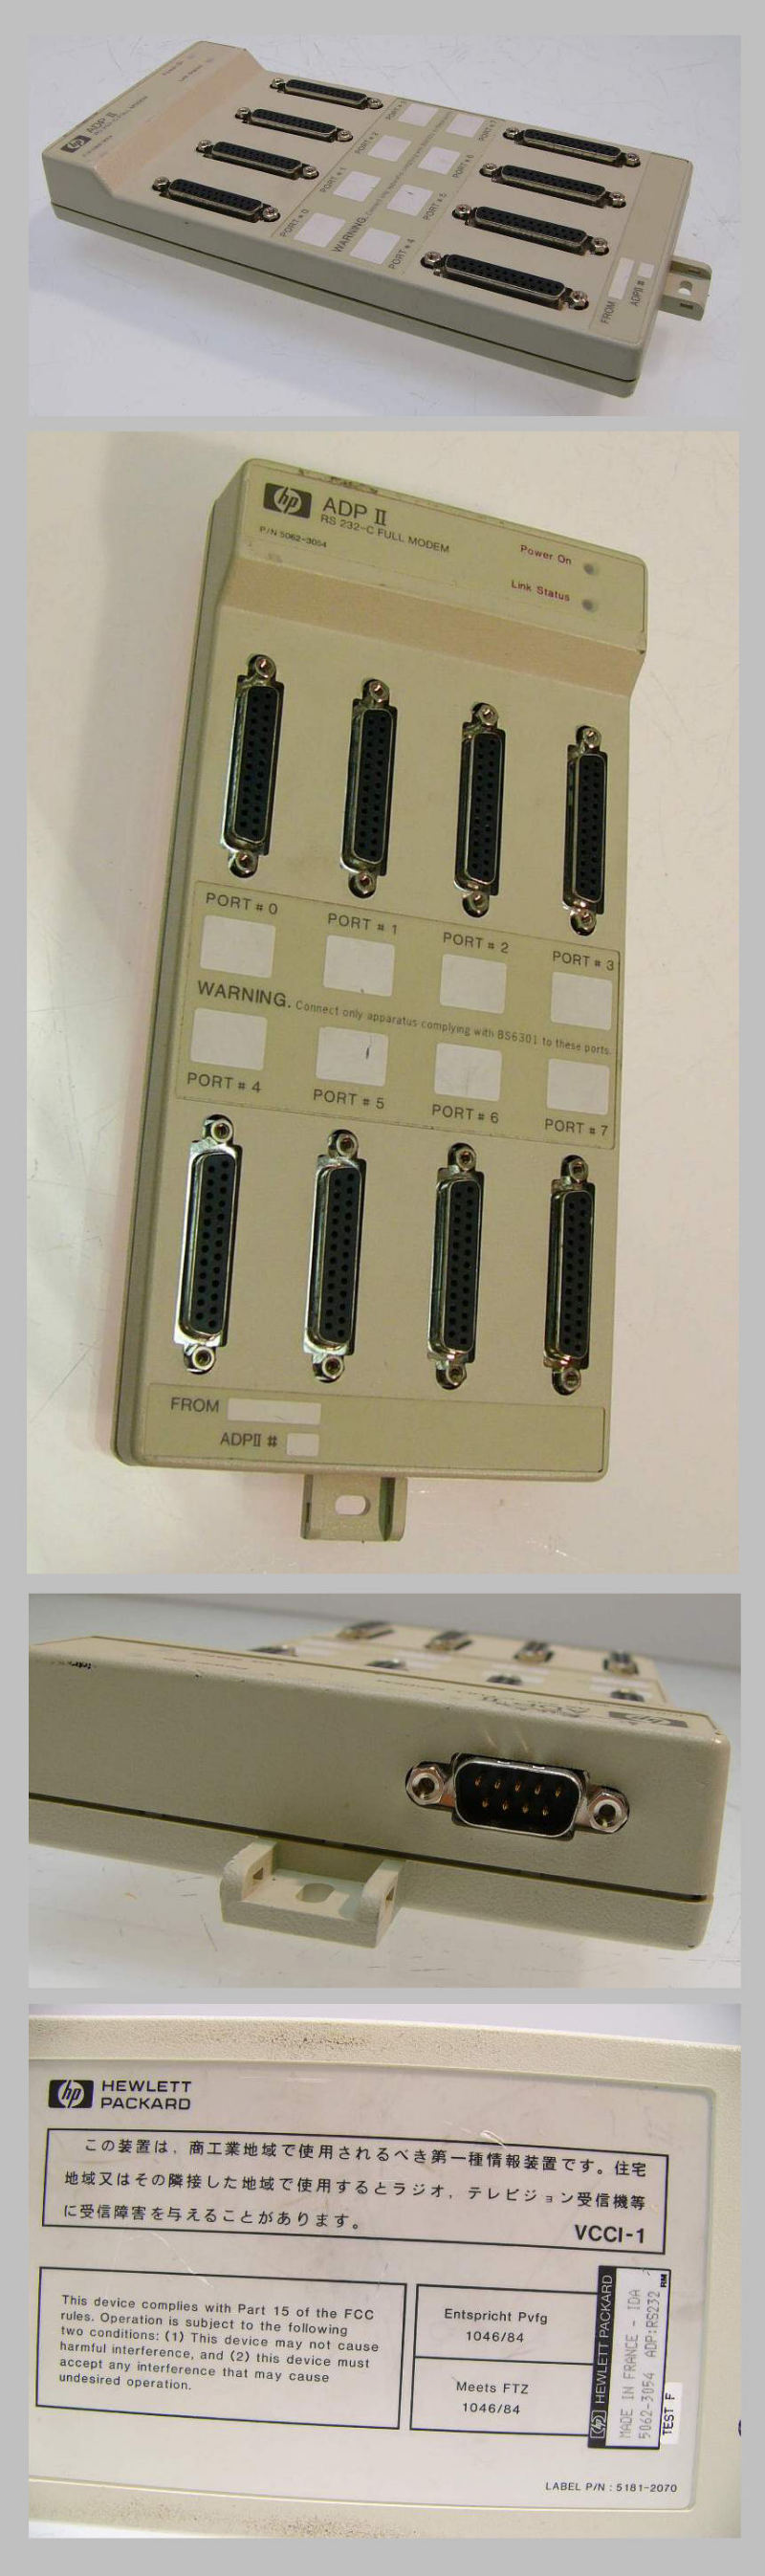 HP ADP II RS 232-C Adapter 5062-3054